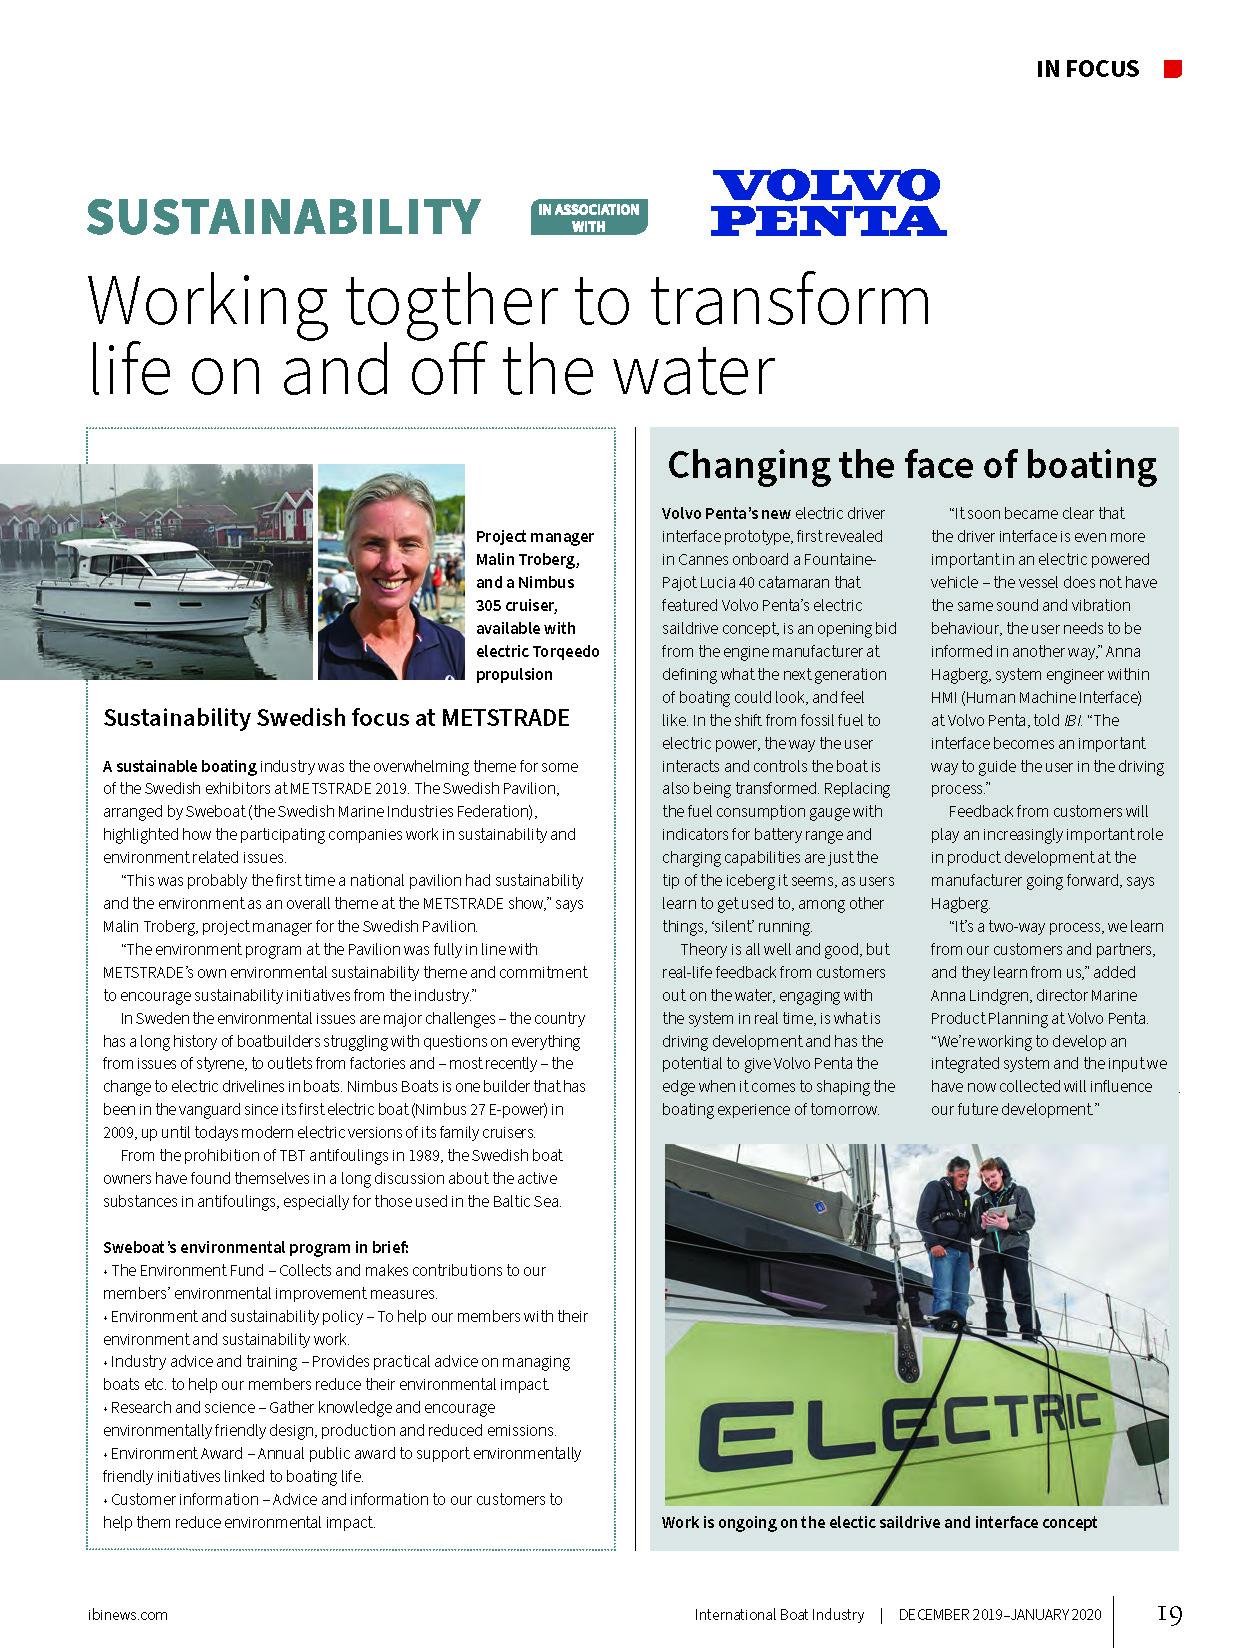 Sustainability_IBI magazine DecJan2020 Issue